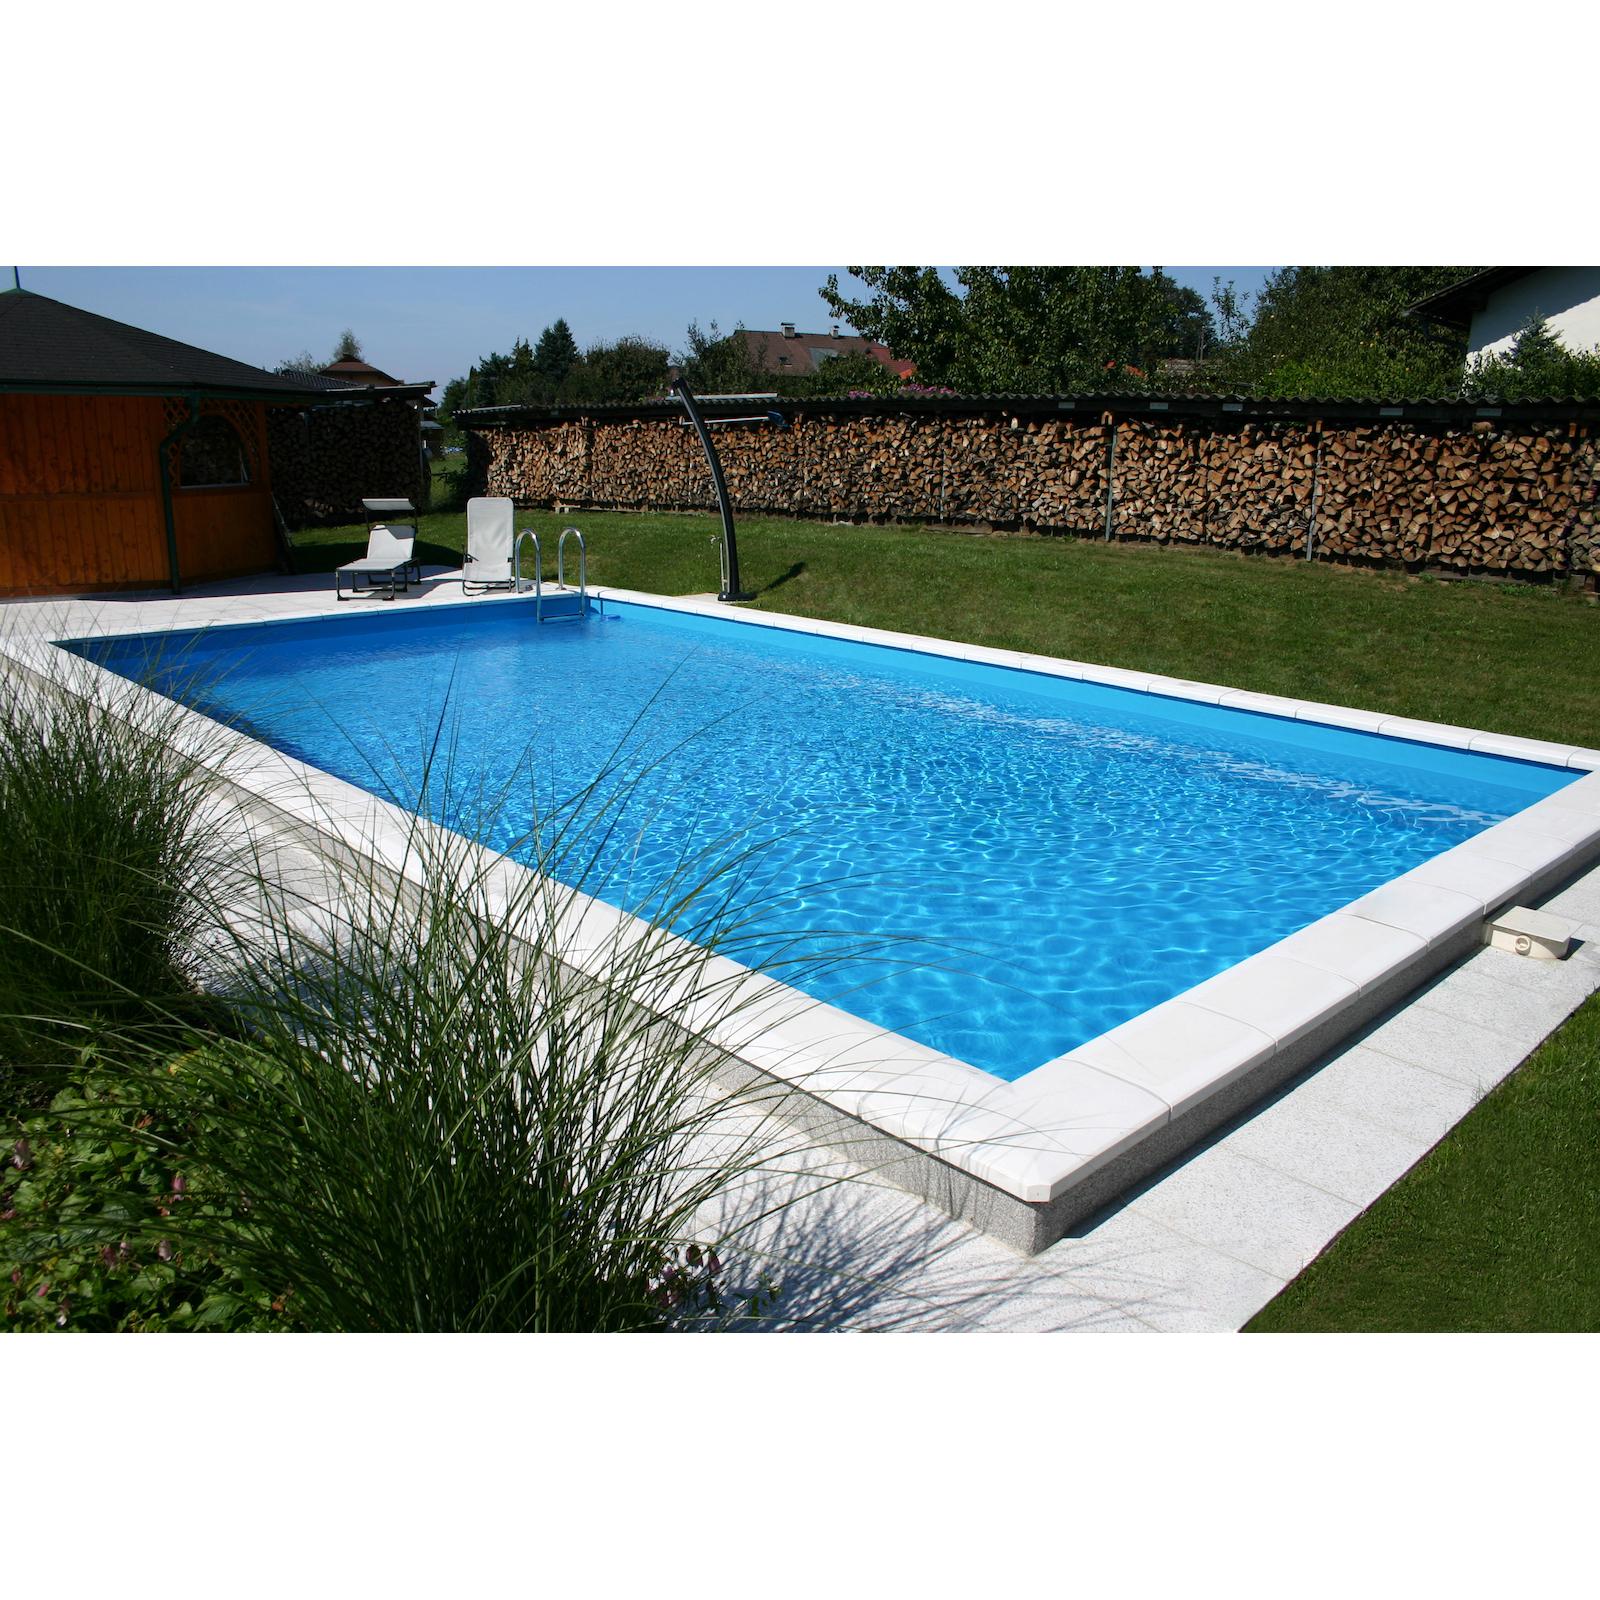 styropor pool rechteckig schwimmbecken bausatz h he 150 cm schwimmbad ebay. Black Bedroom Furniture Sets. Home Design Ideas